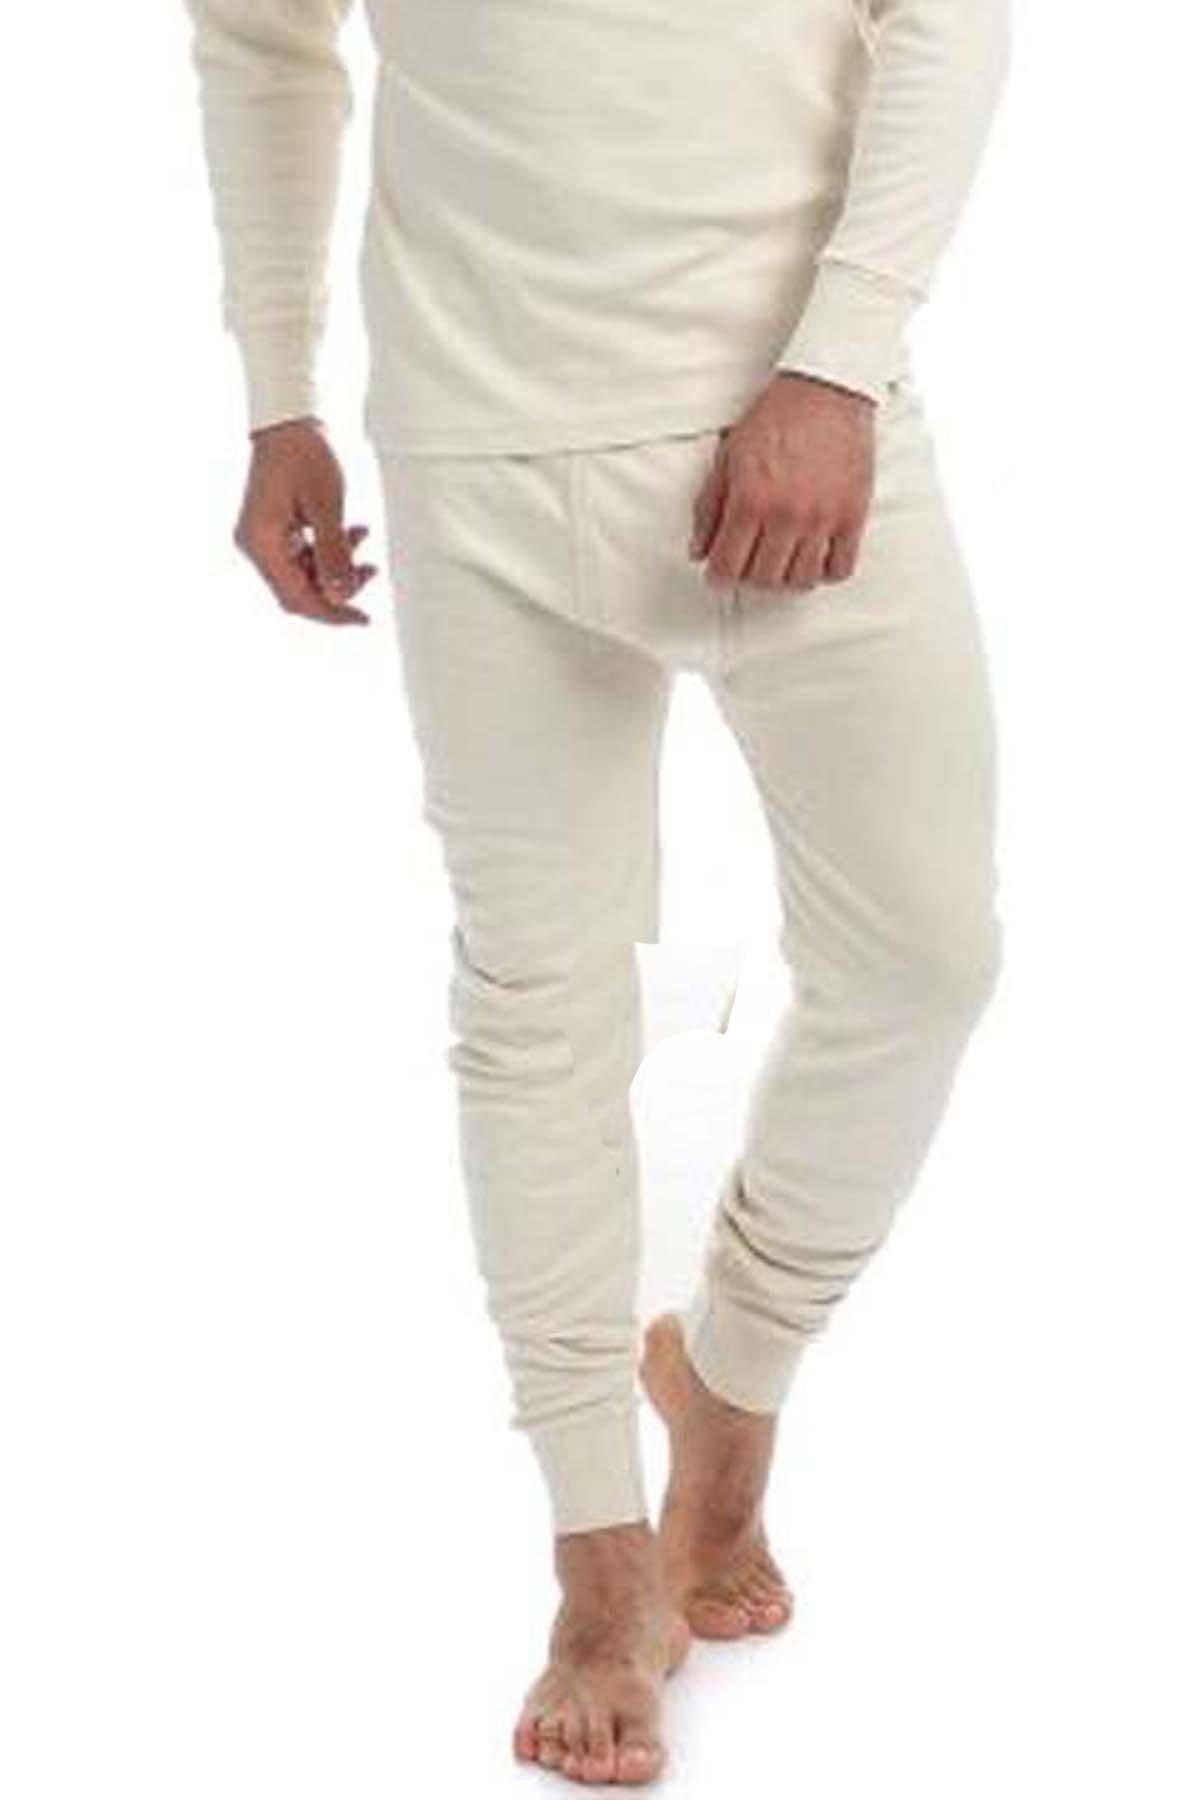 Men's Thermal 100% Cotton Long Johns (240 GSM) Soft Underwear (XL, Cream) by Elegance1234